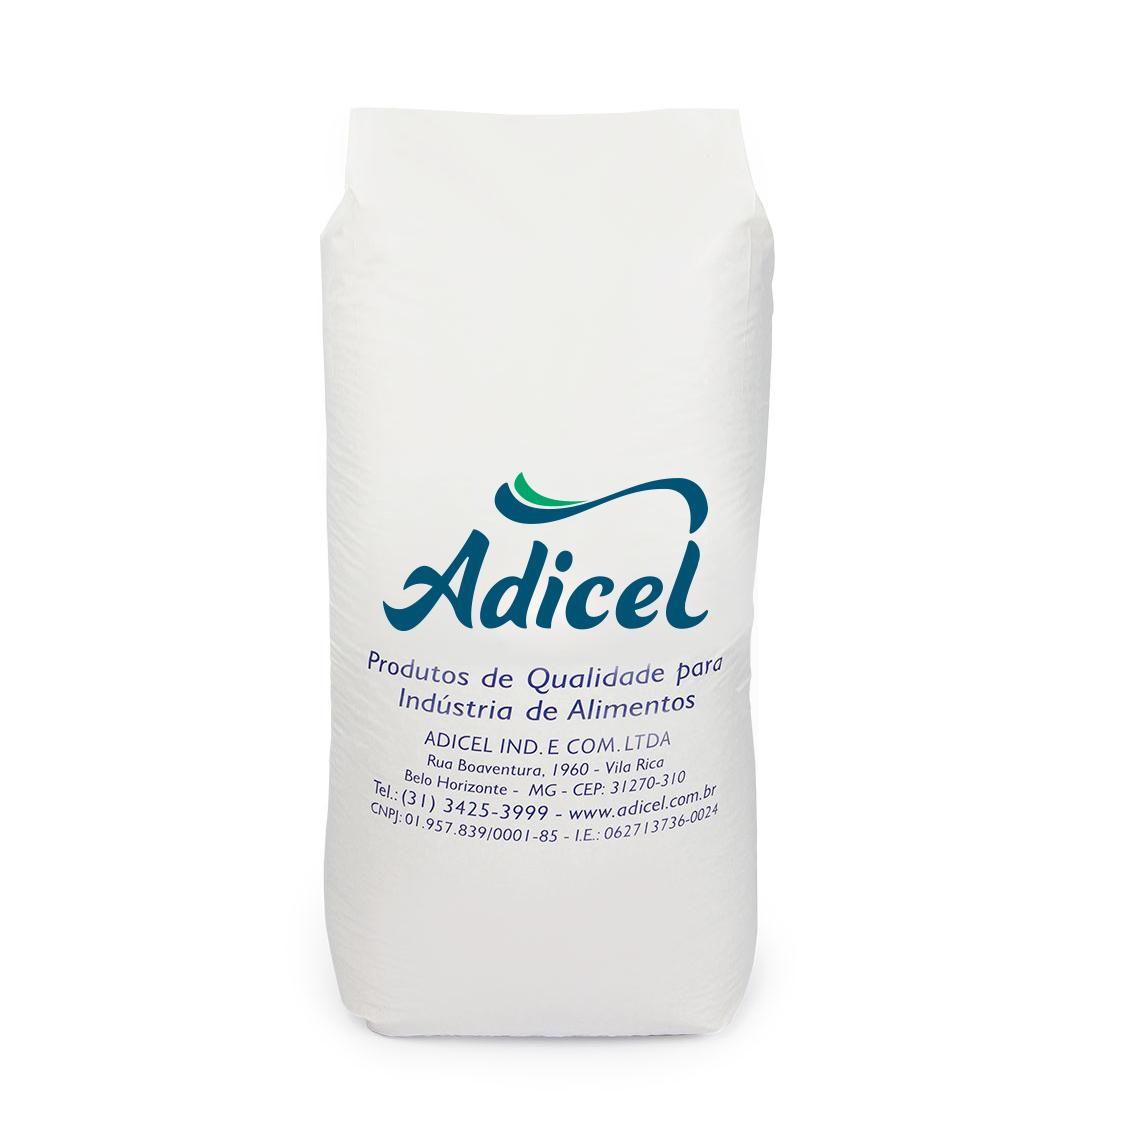 Pirofosfato Acido de Sodio - 25kg